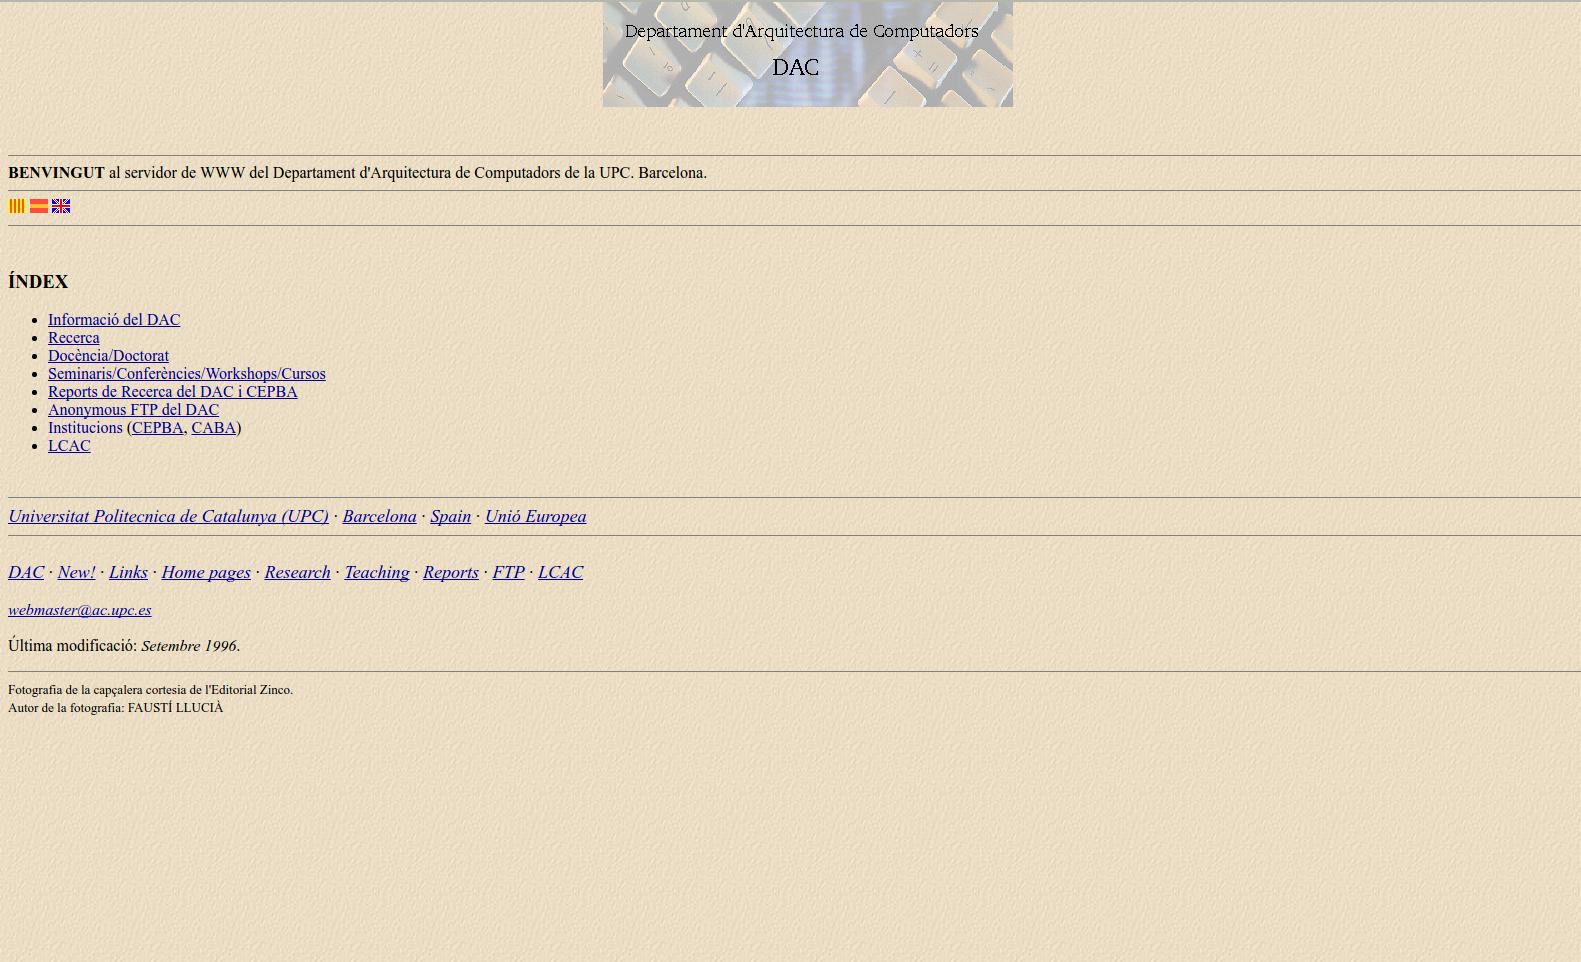 1996 web page